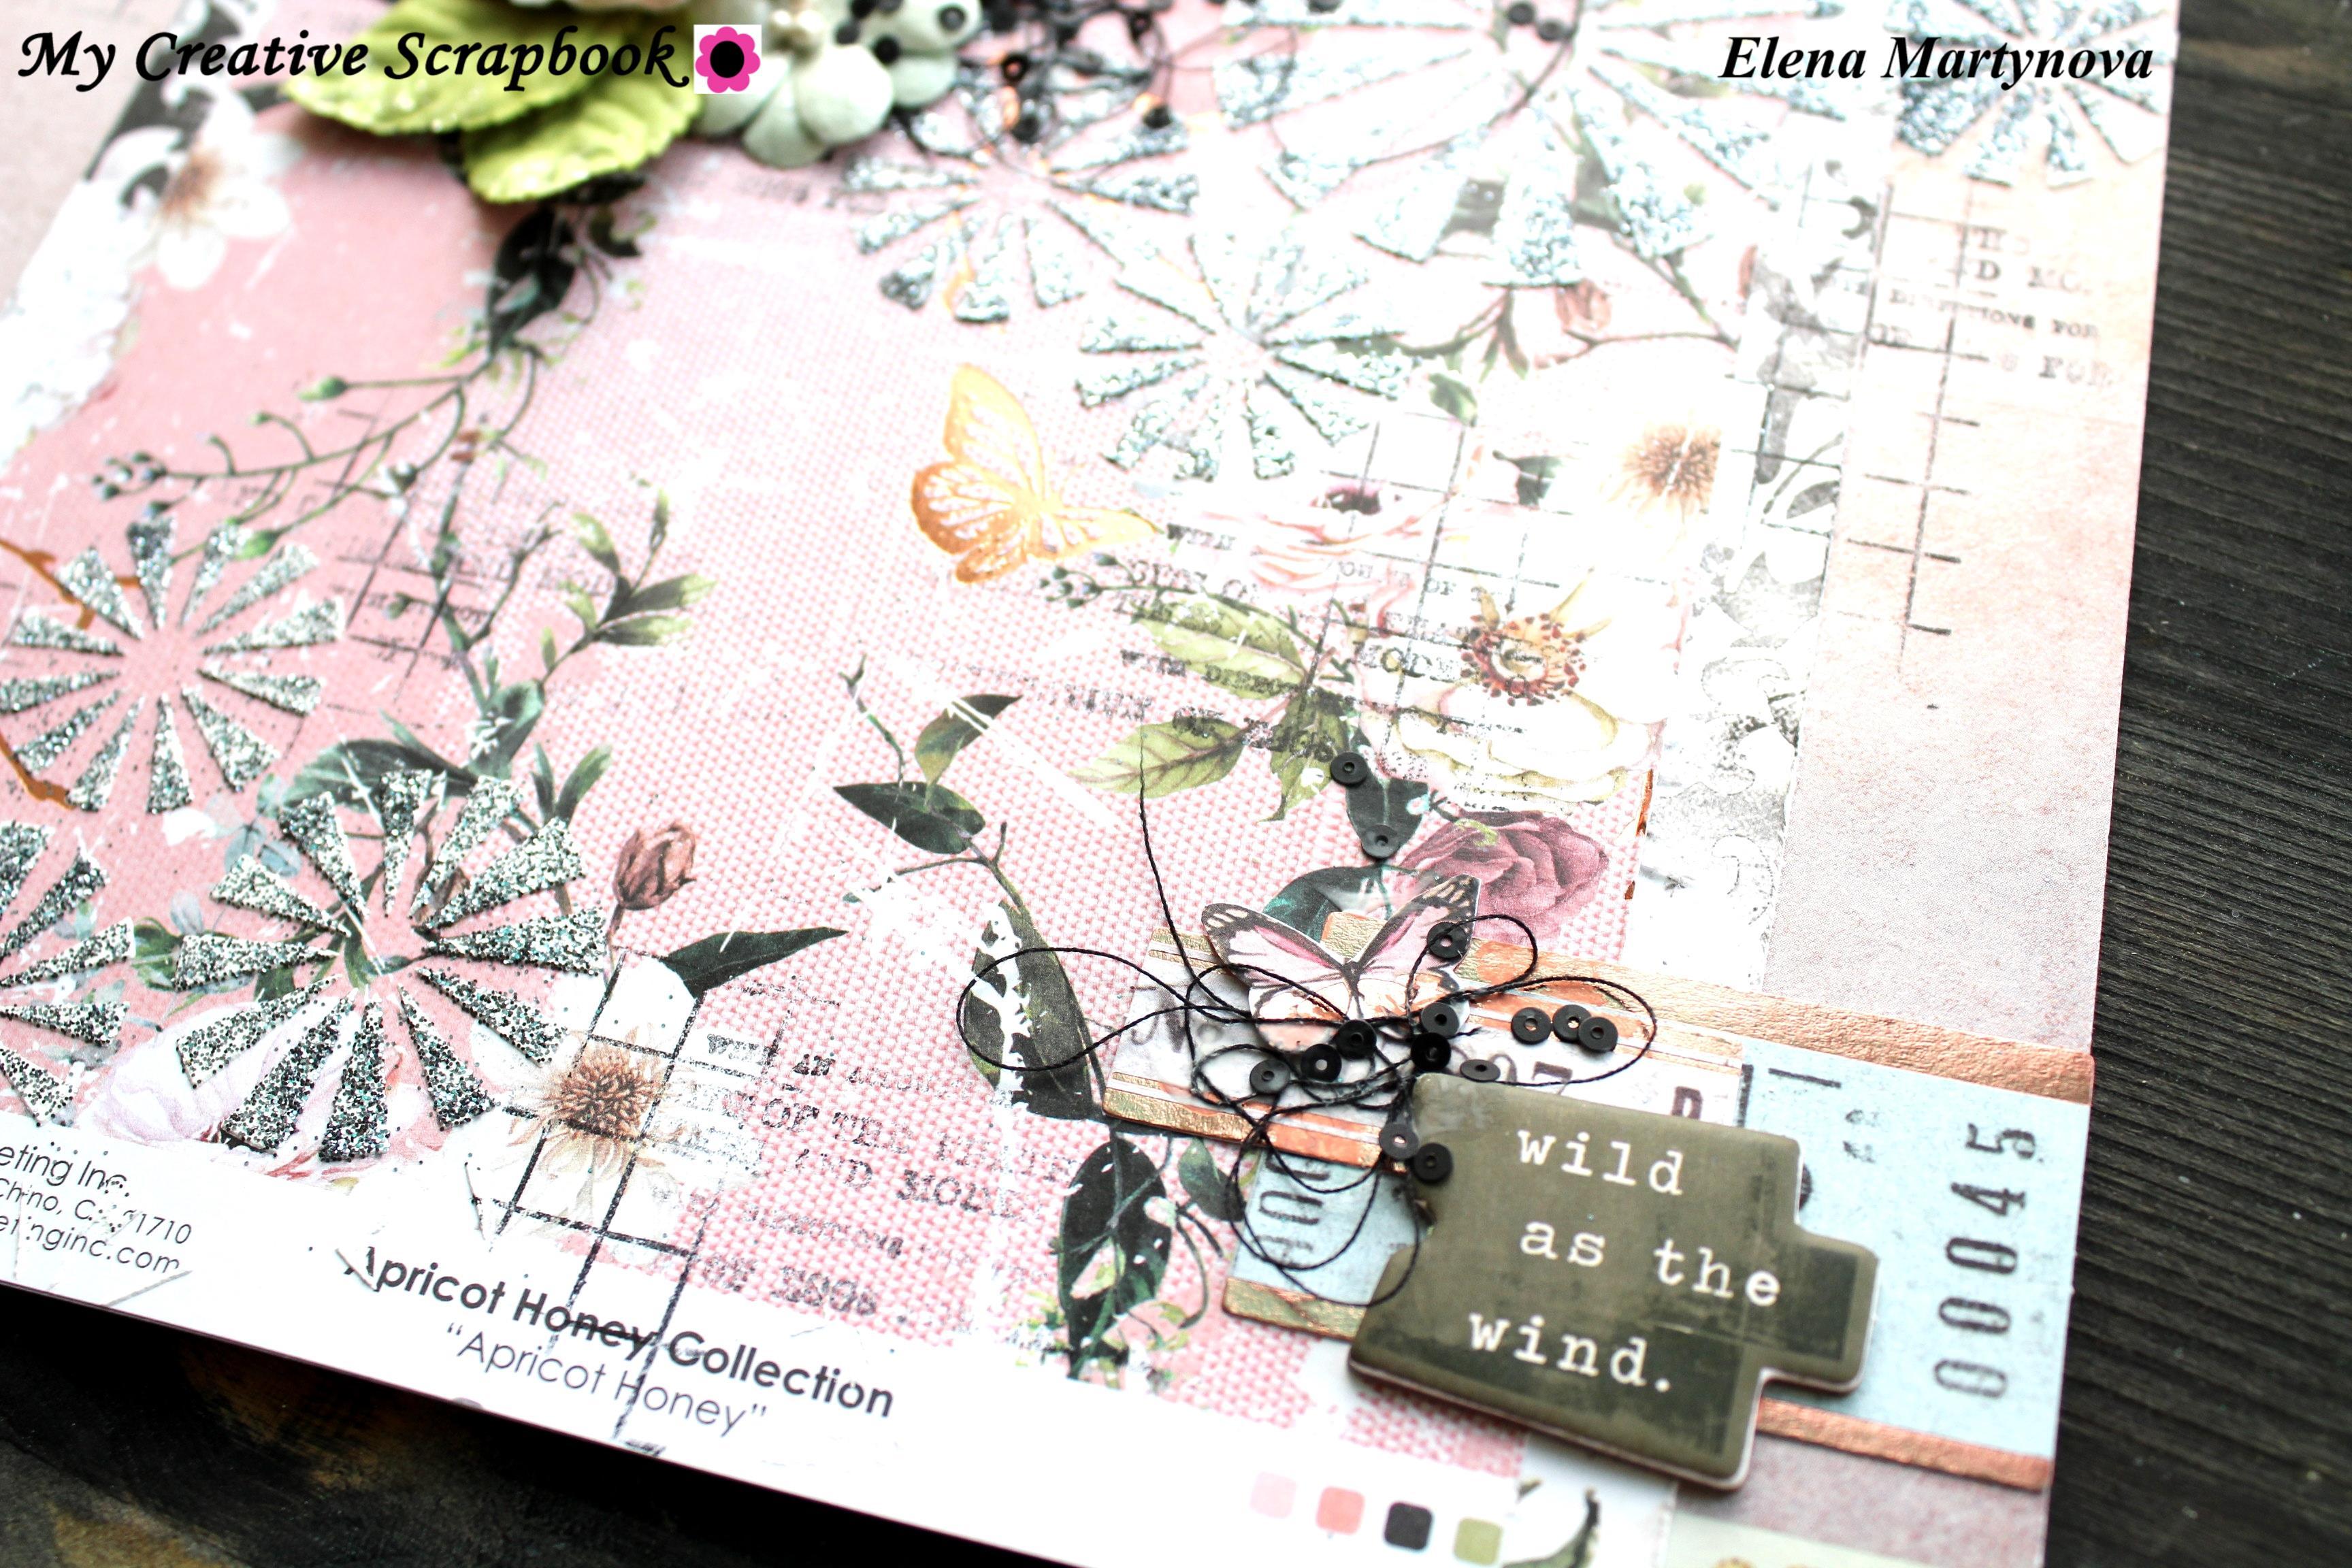 MCS-Elena Martynova-LE Kit-Aug-LO3(4)-1